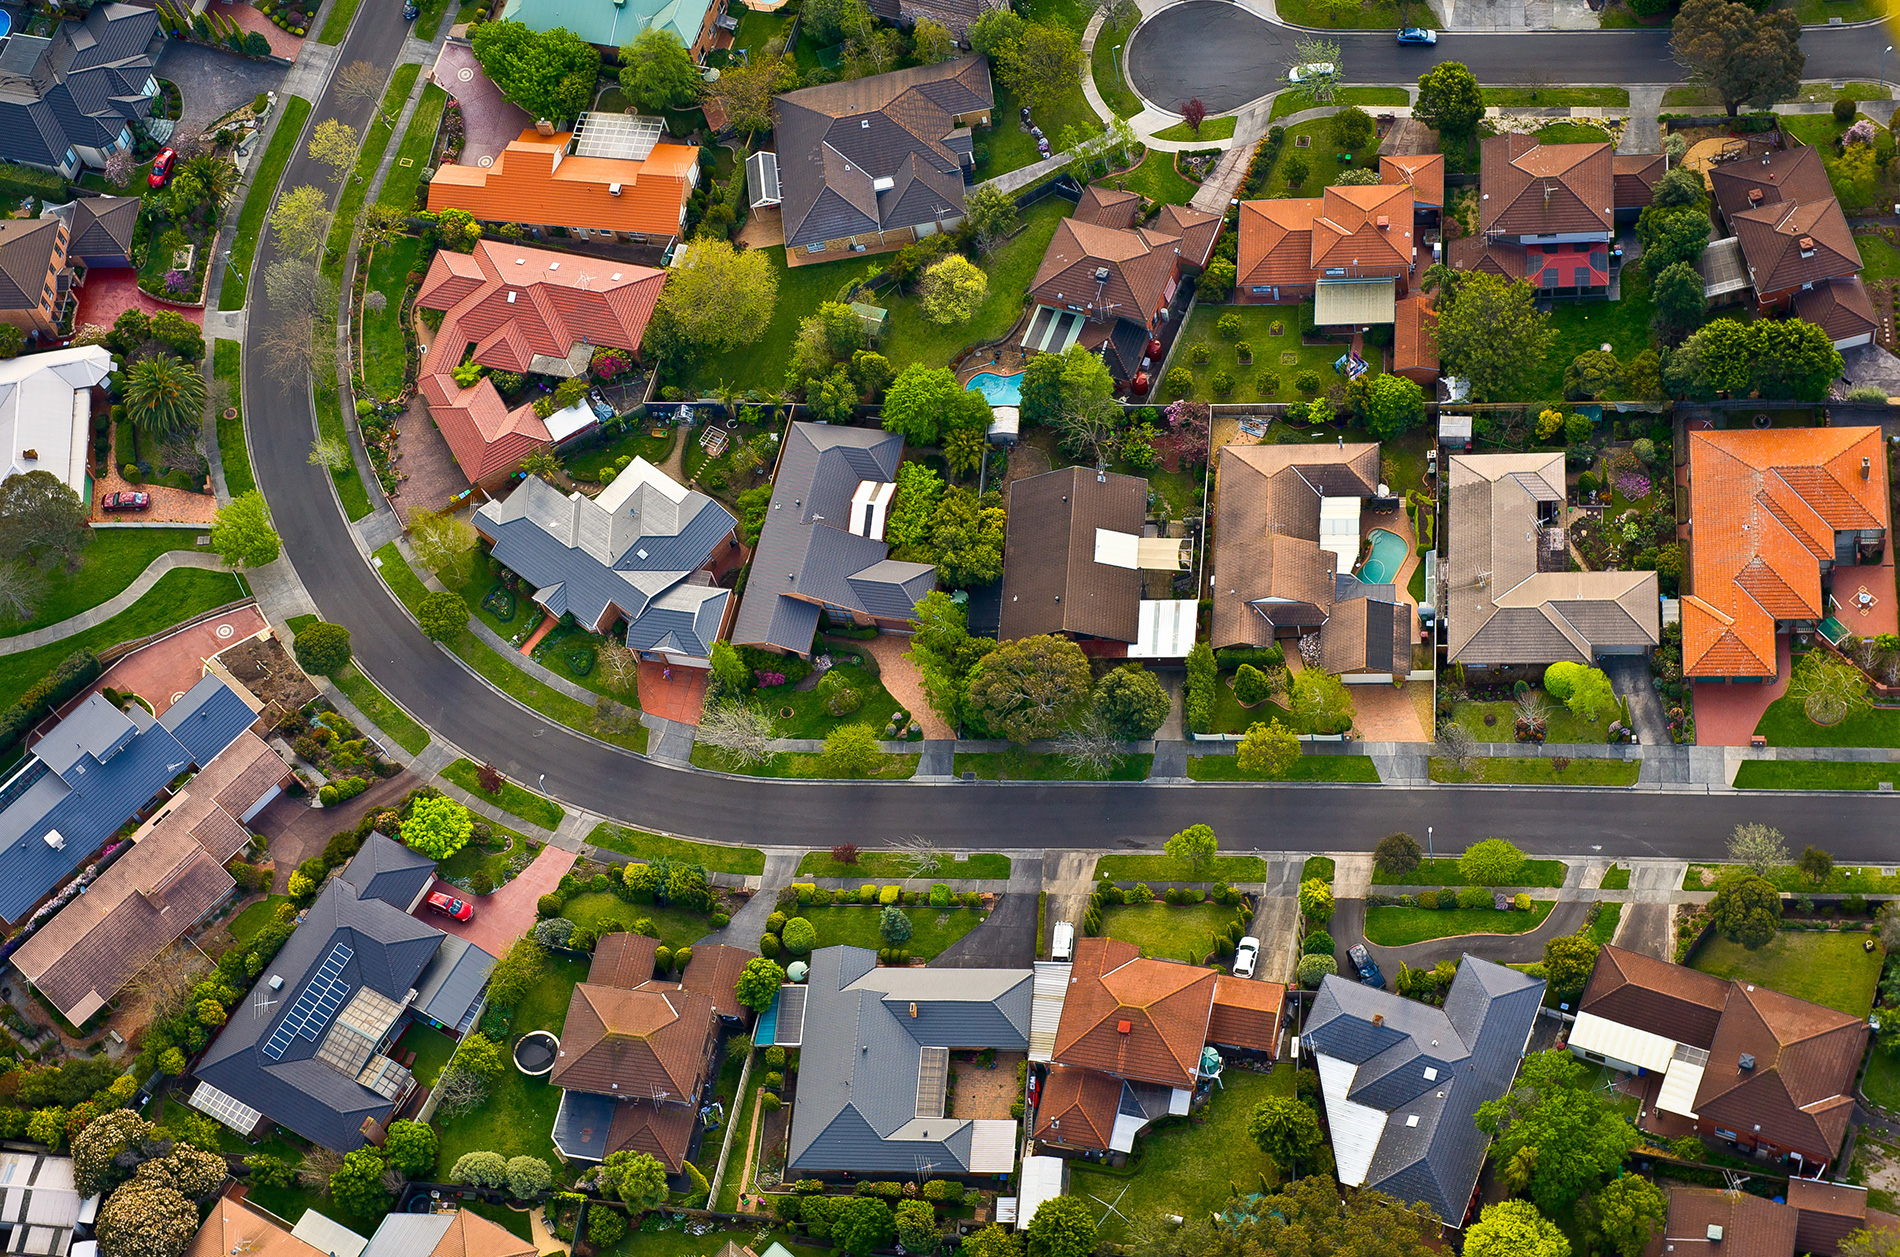 Rooftops in neighborhood